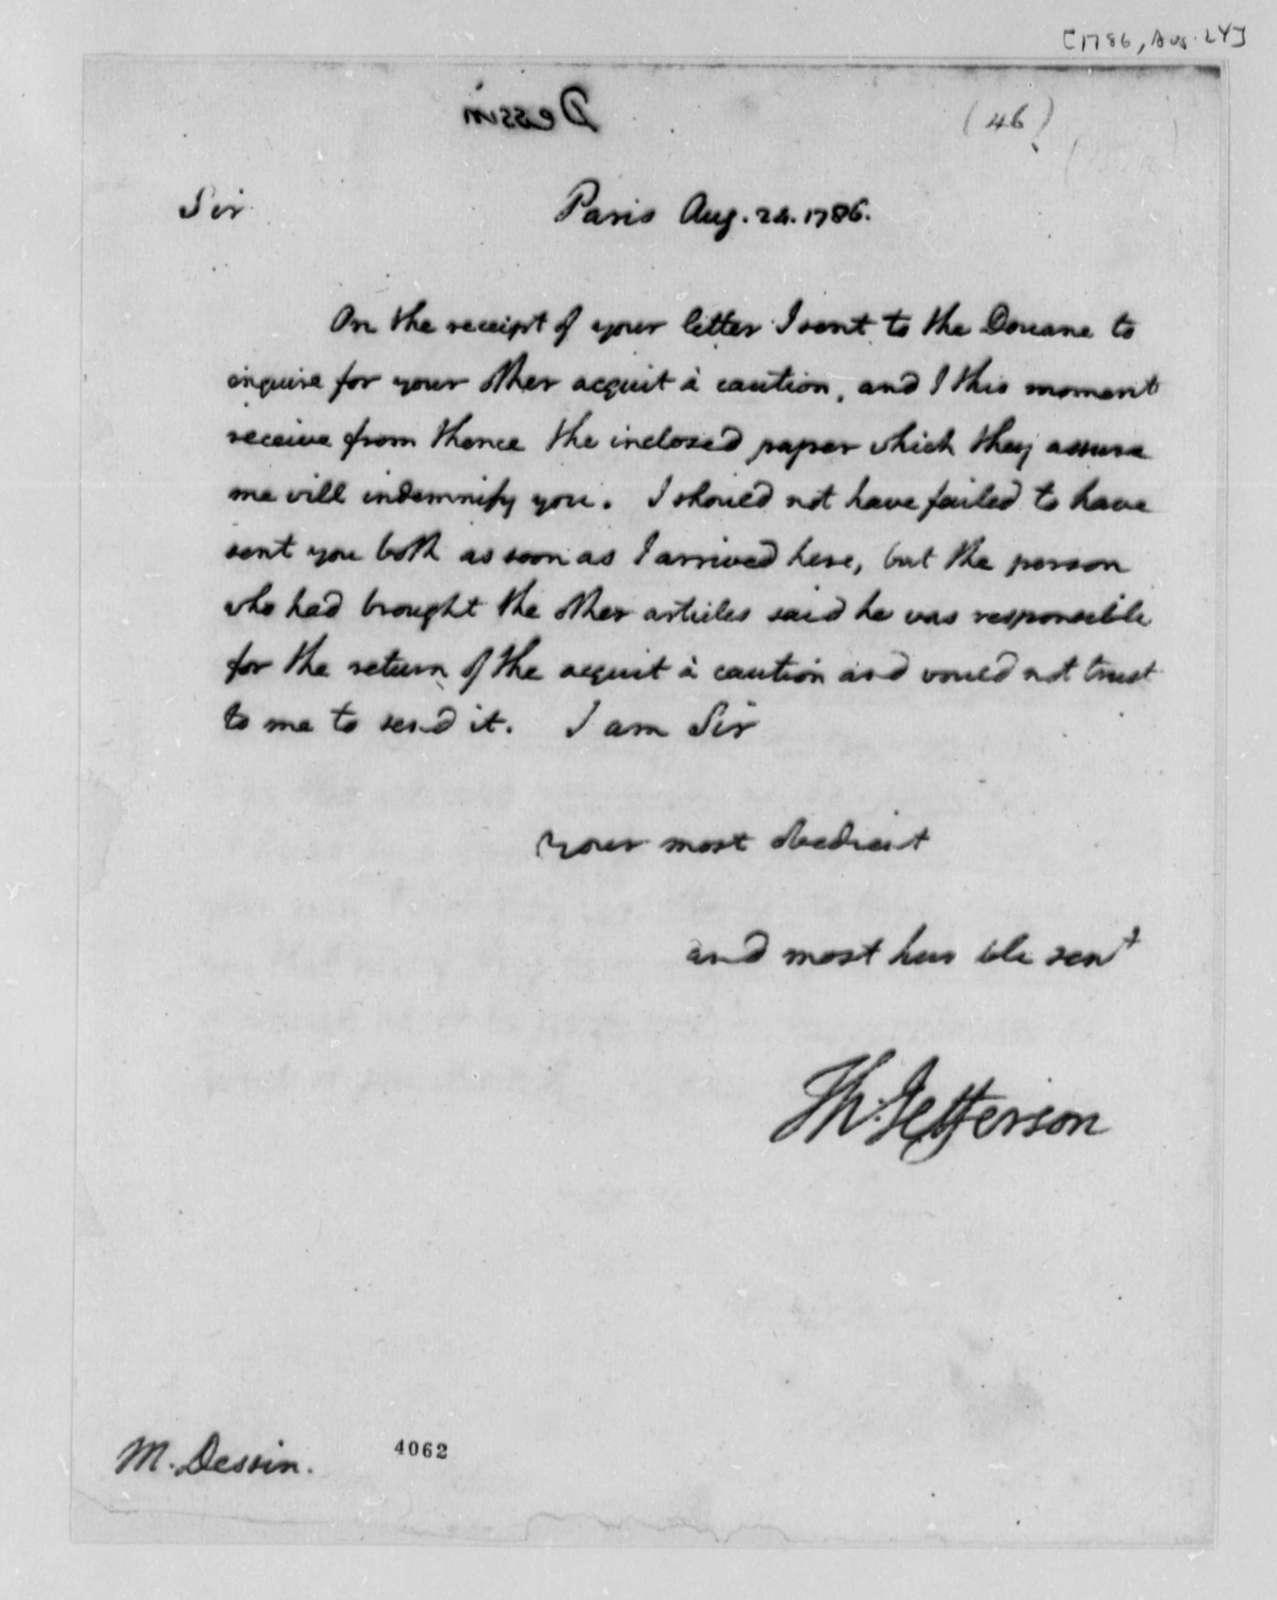 Thomas Jefferson to Pierre Dessin, August 24, 1786